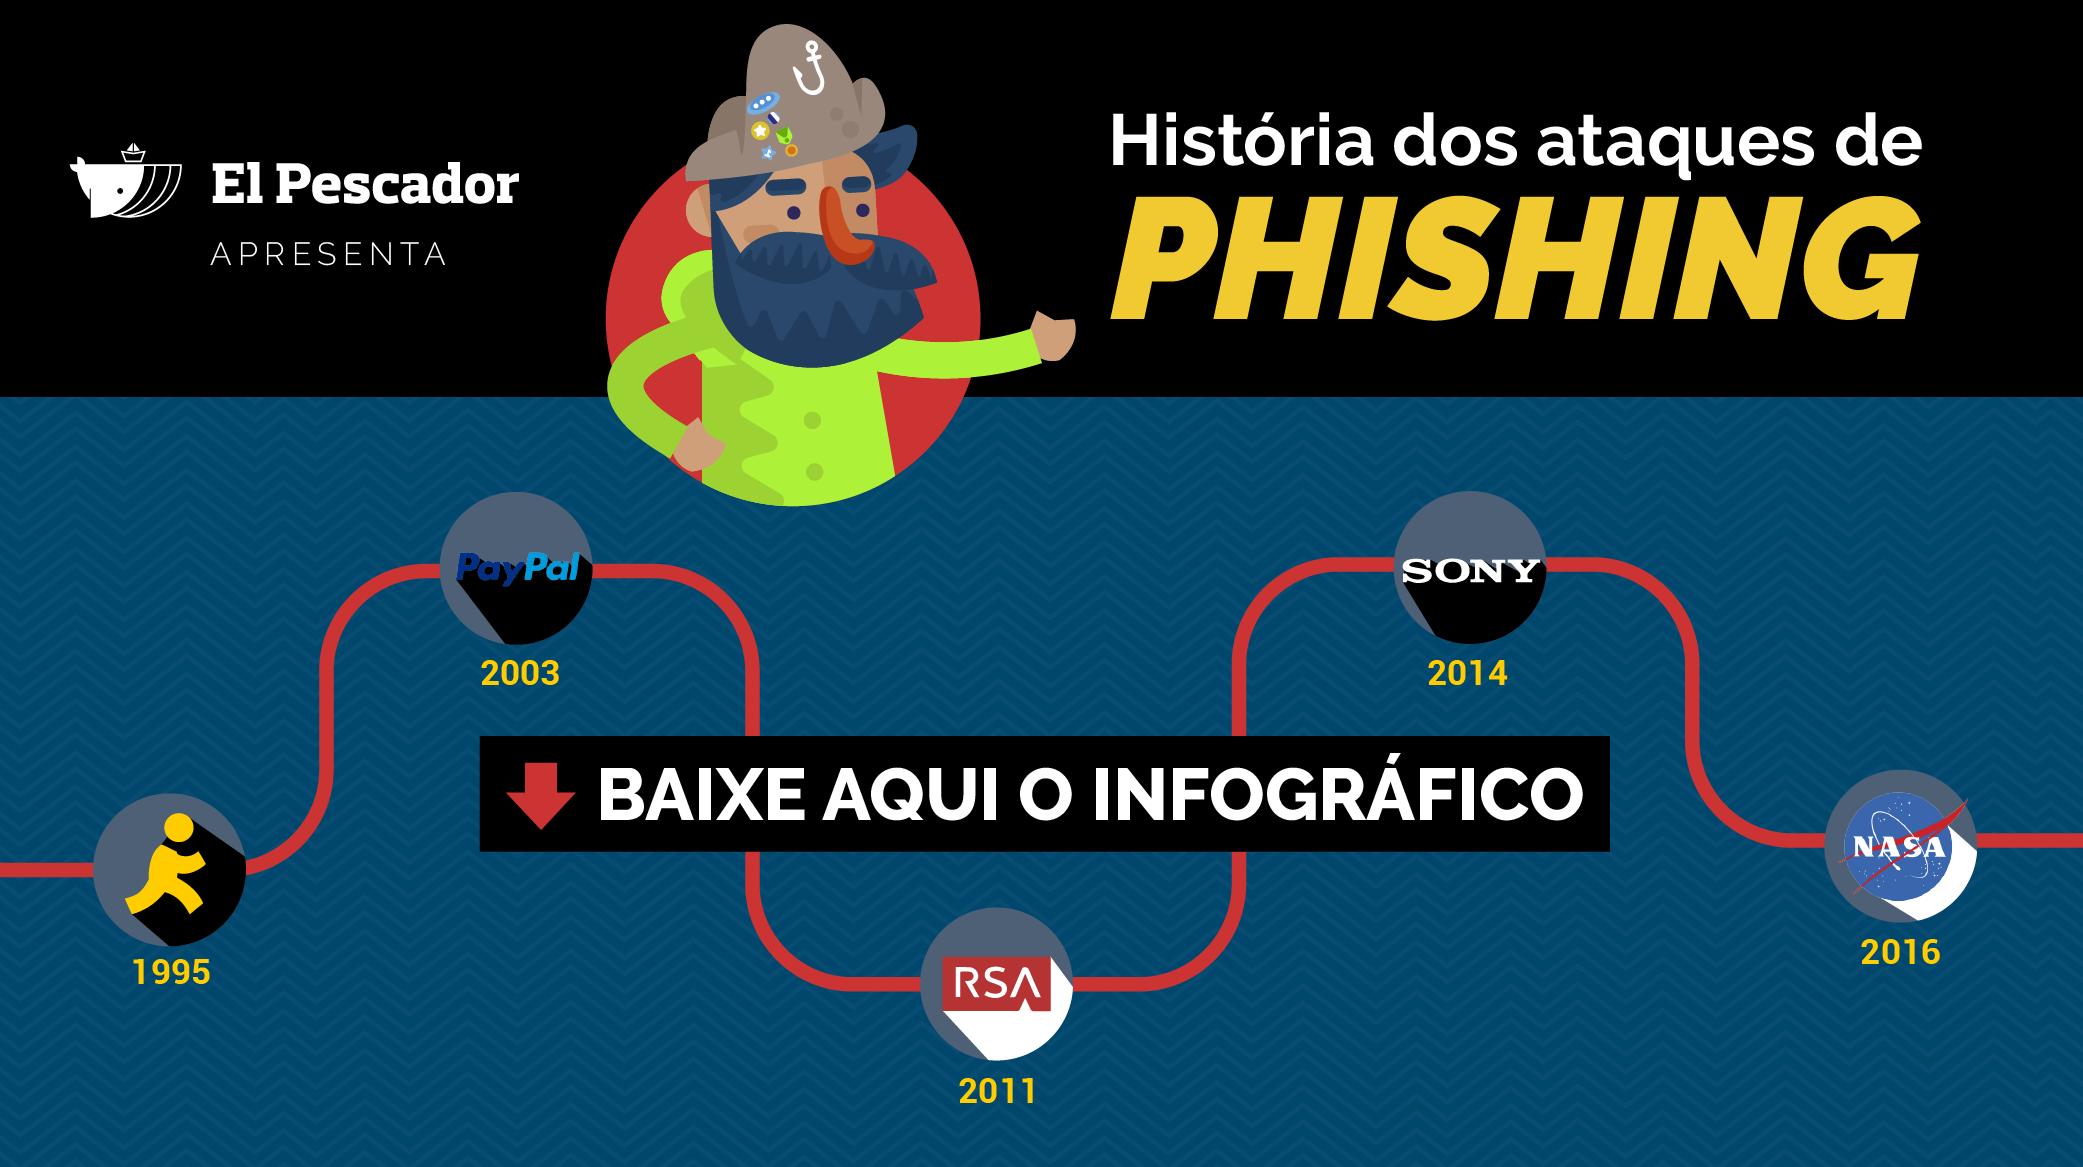 História dos ataques de Phishing